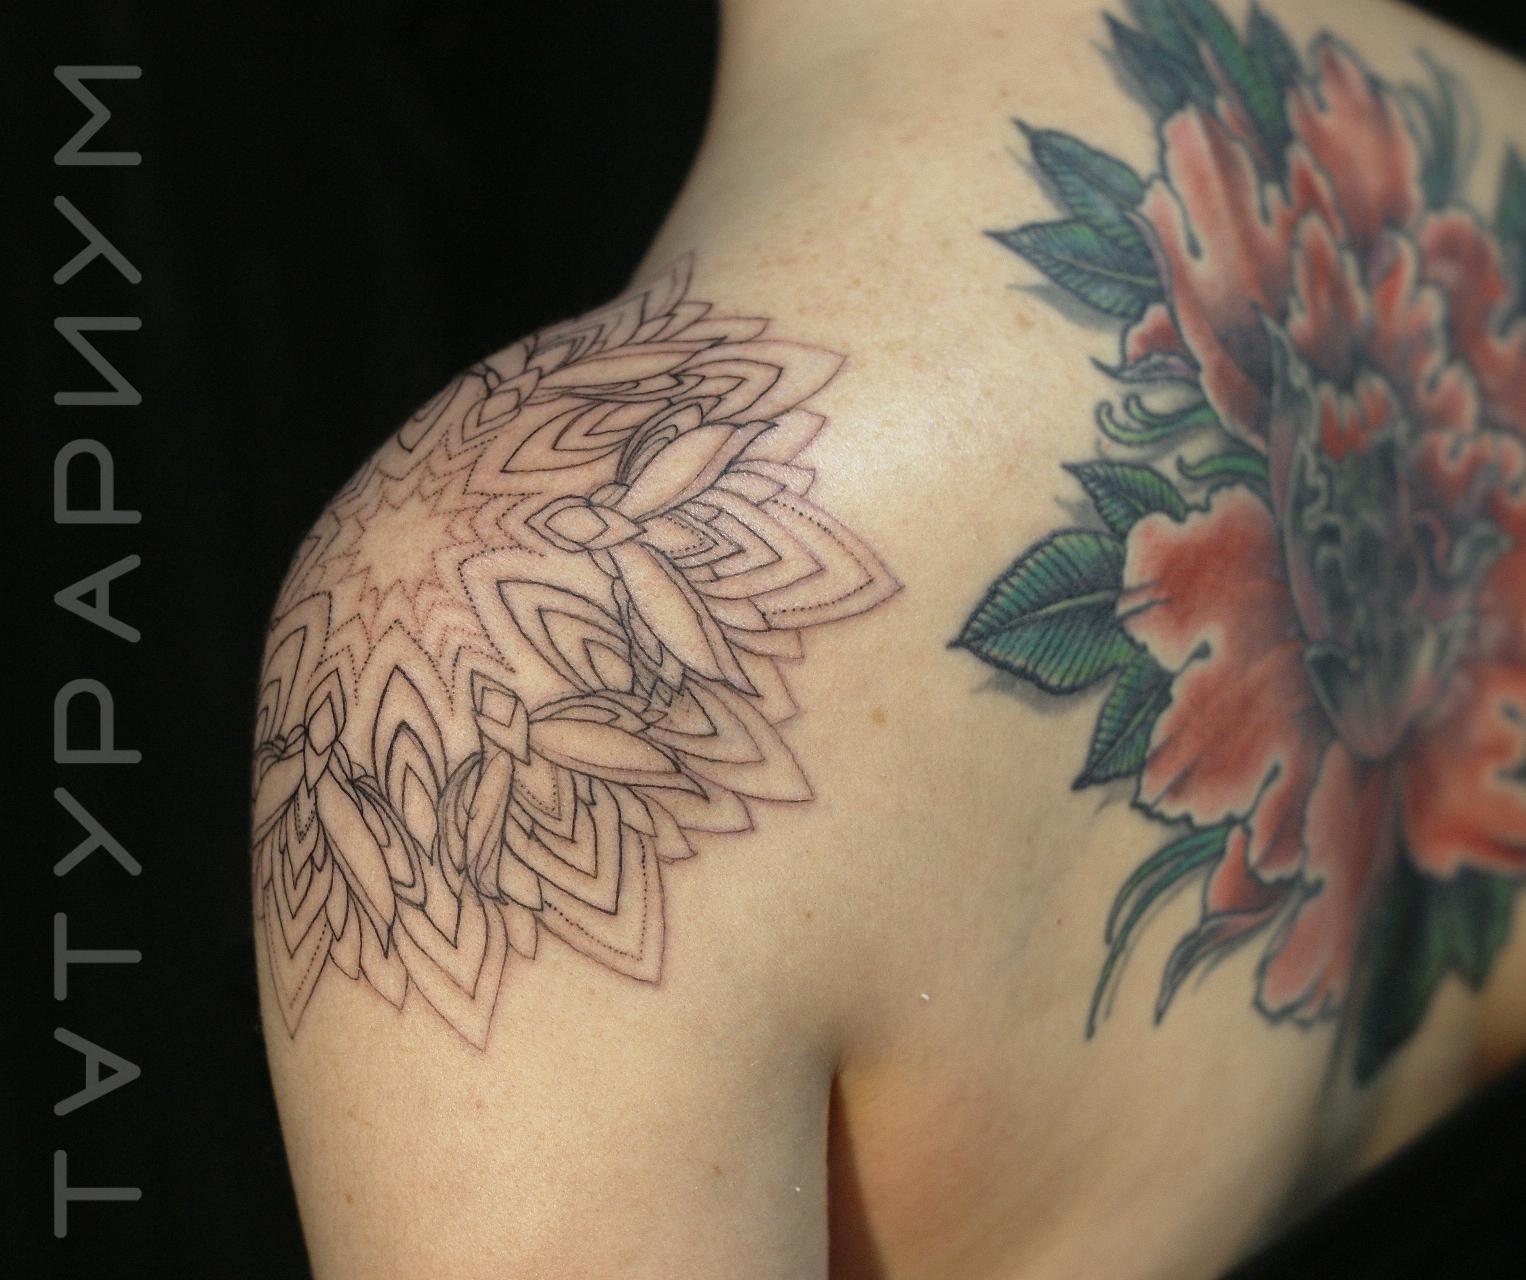 Фото татуировки, воздушная мандала на пл